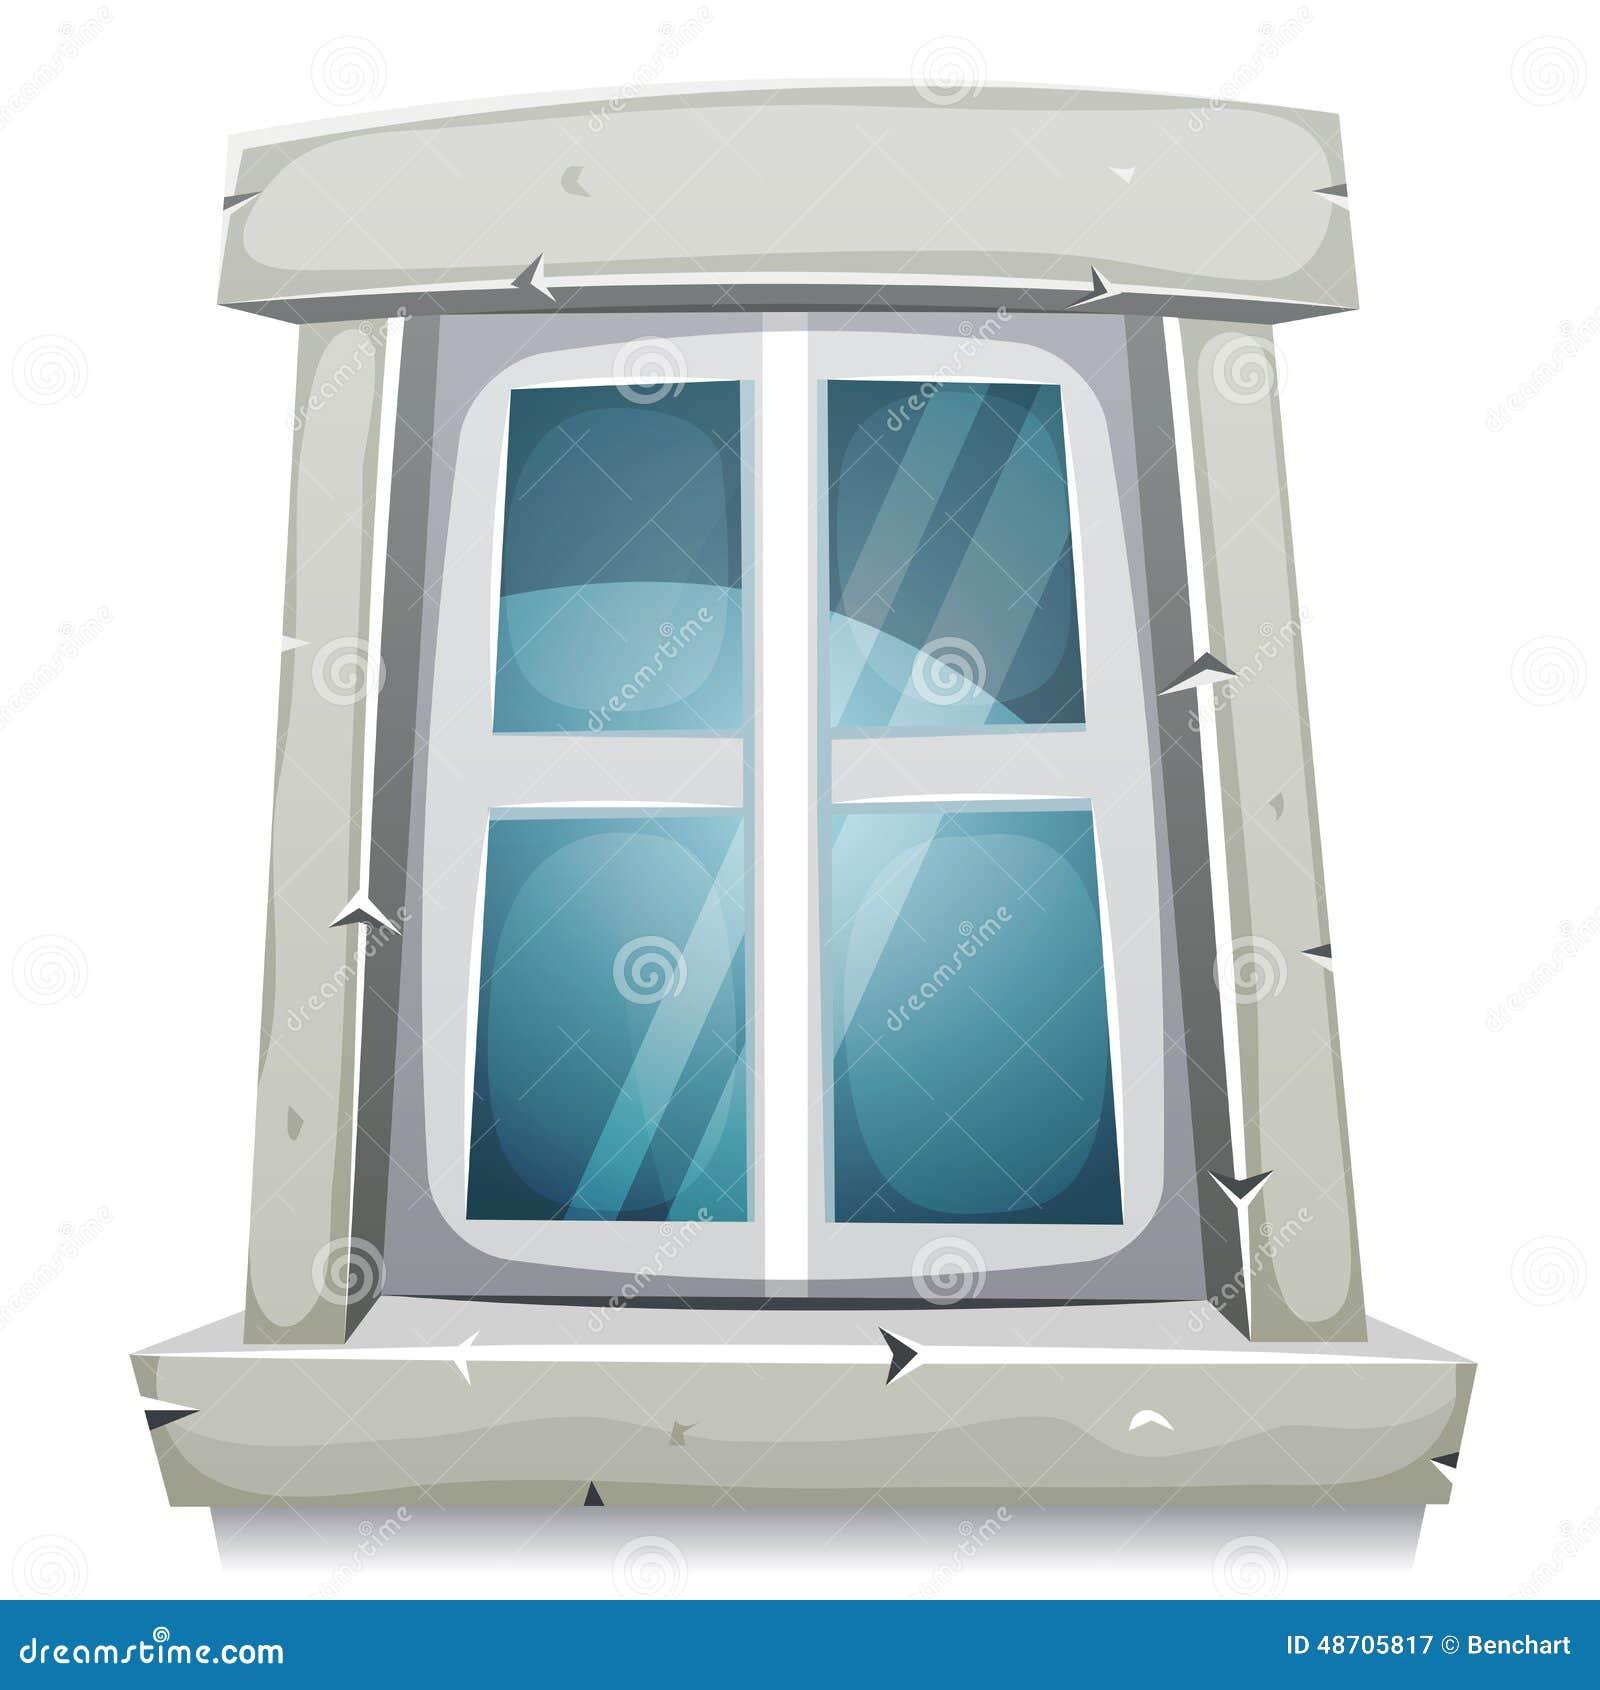 fen tre ferm e de bande dessin e illustration de vecteur image 48705817. Black Bedroom Furniture Sets. Home Design Ideas